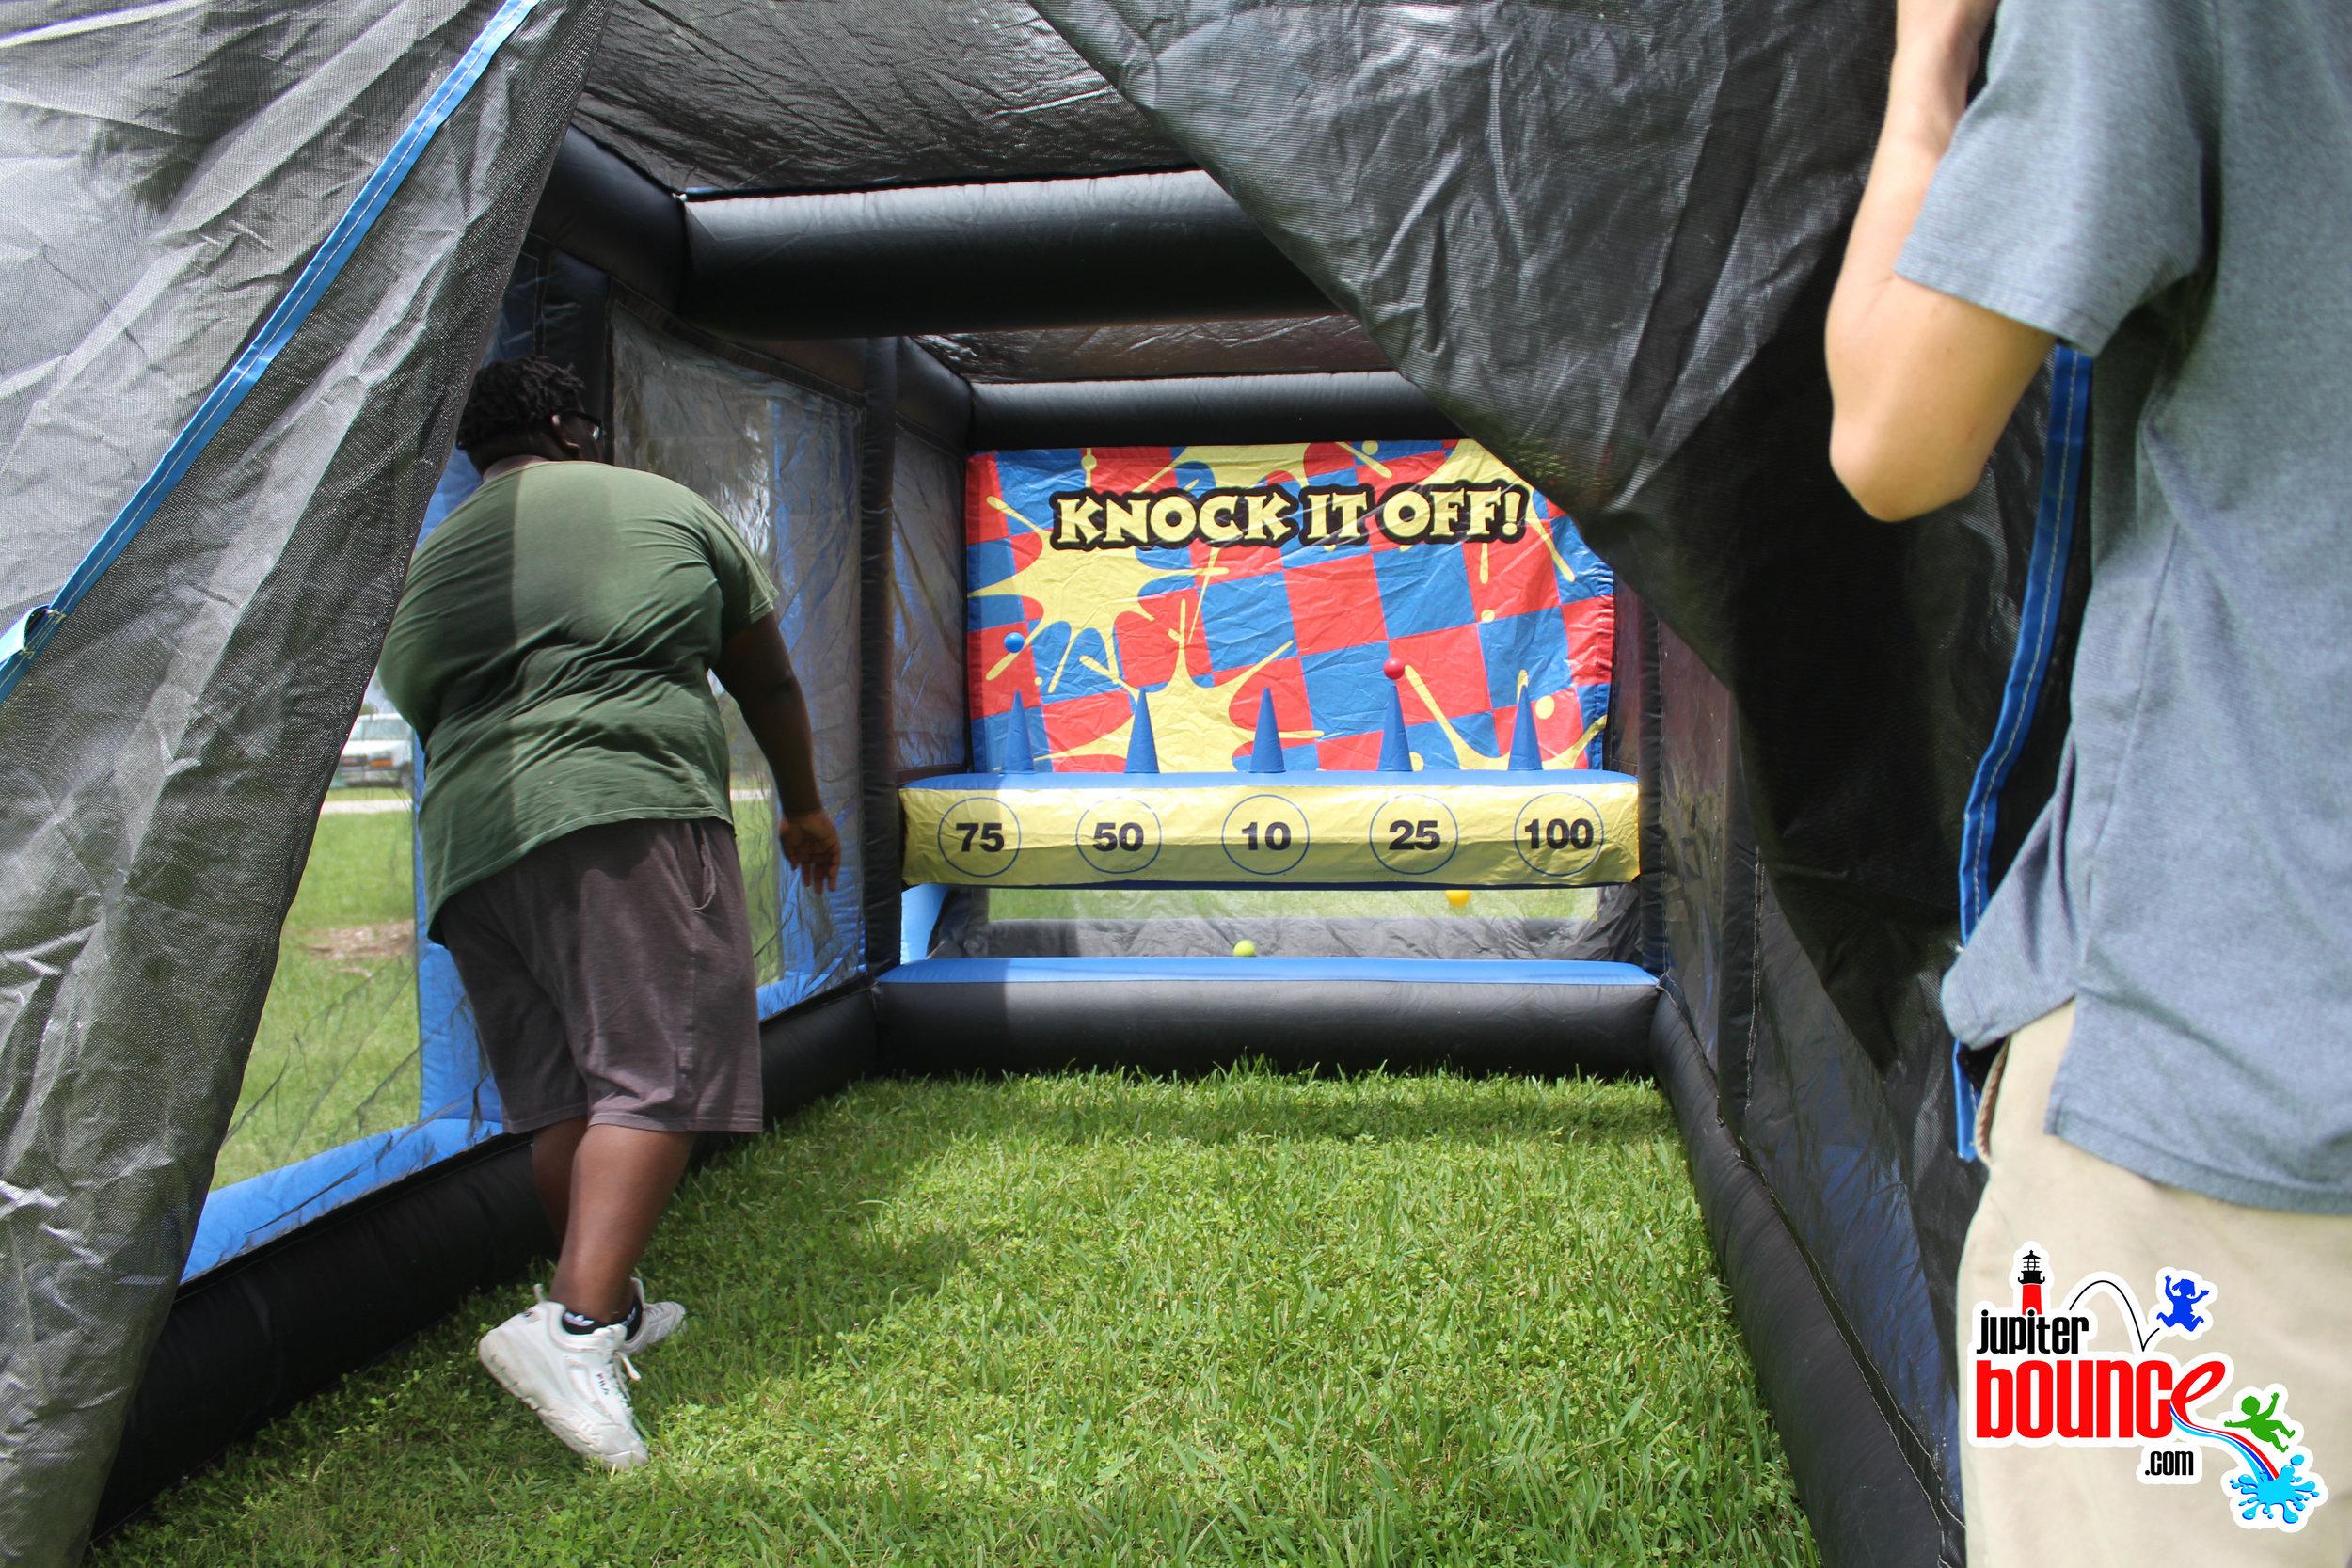 knockitoff-baseballgame-pitching-sportsgamerental-baseball-rogerdeanchevroletstadium-jtaa-tequesta-junobeach-palmbeachcounty.jpg